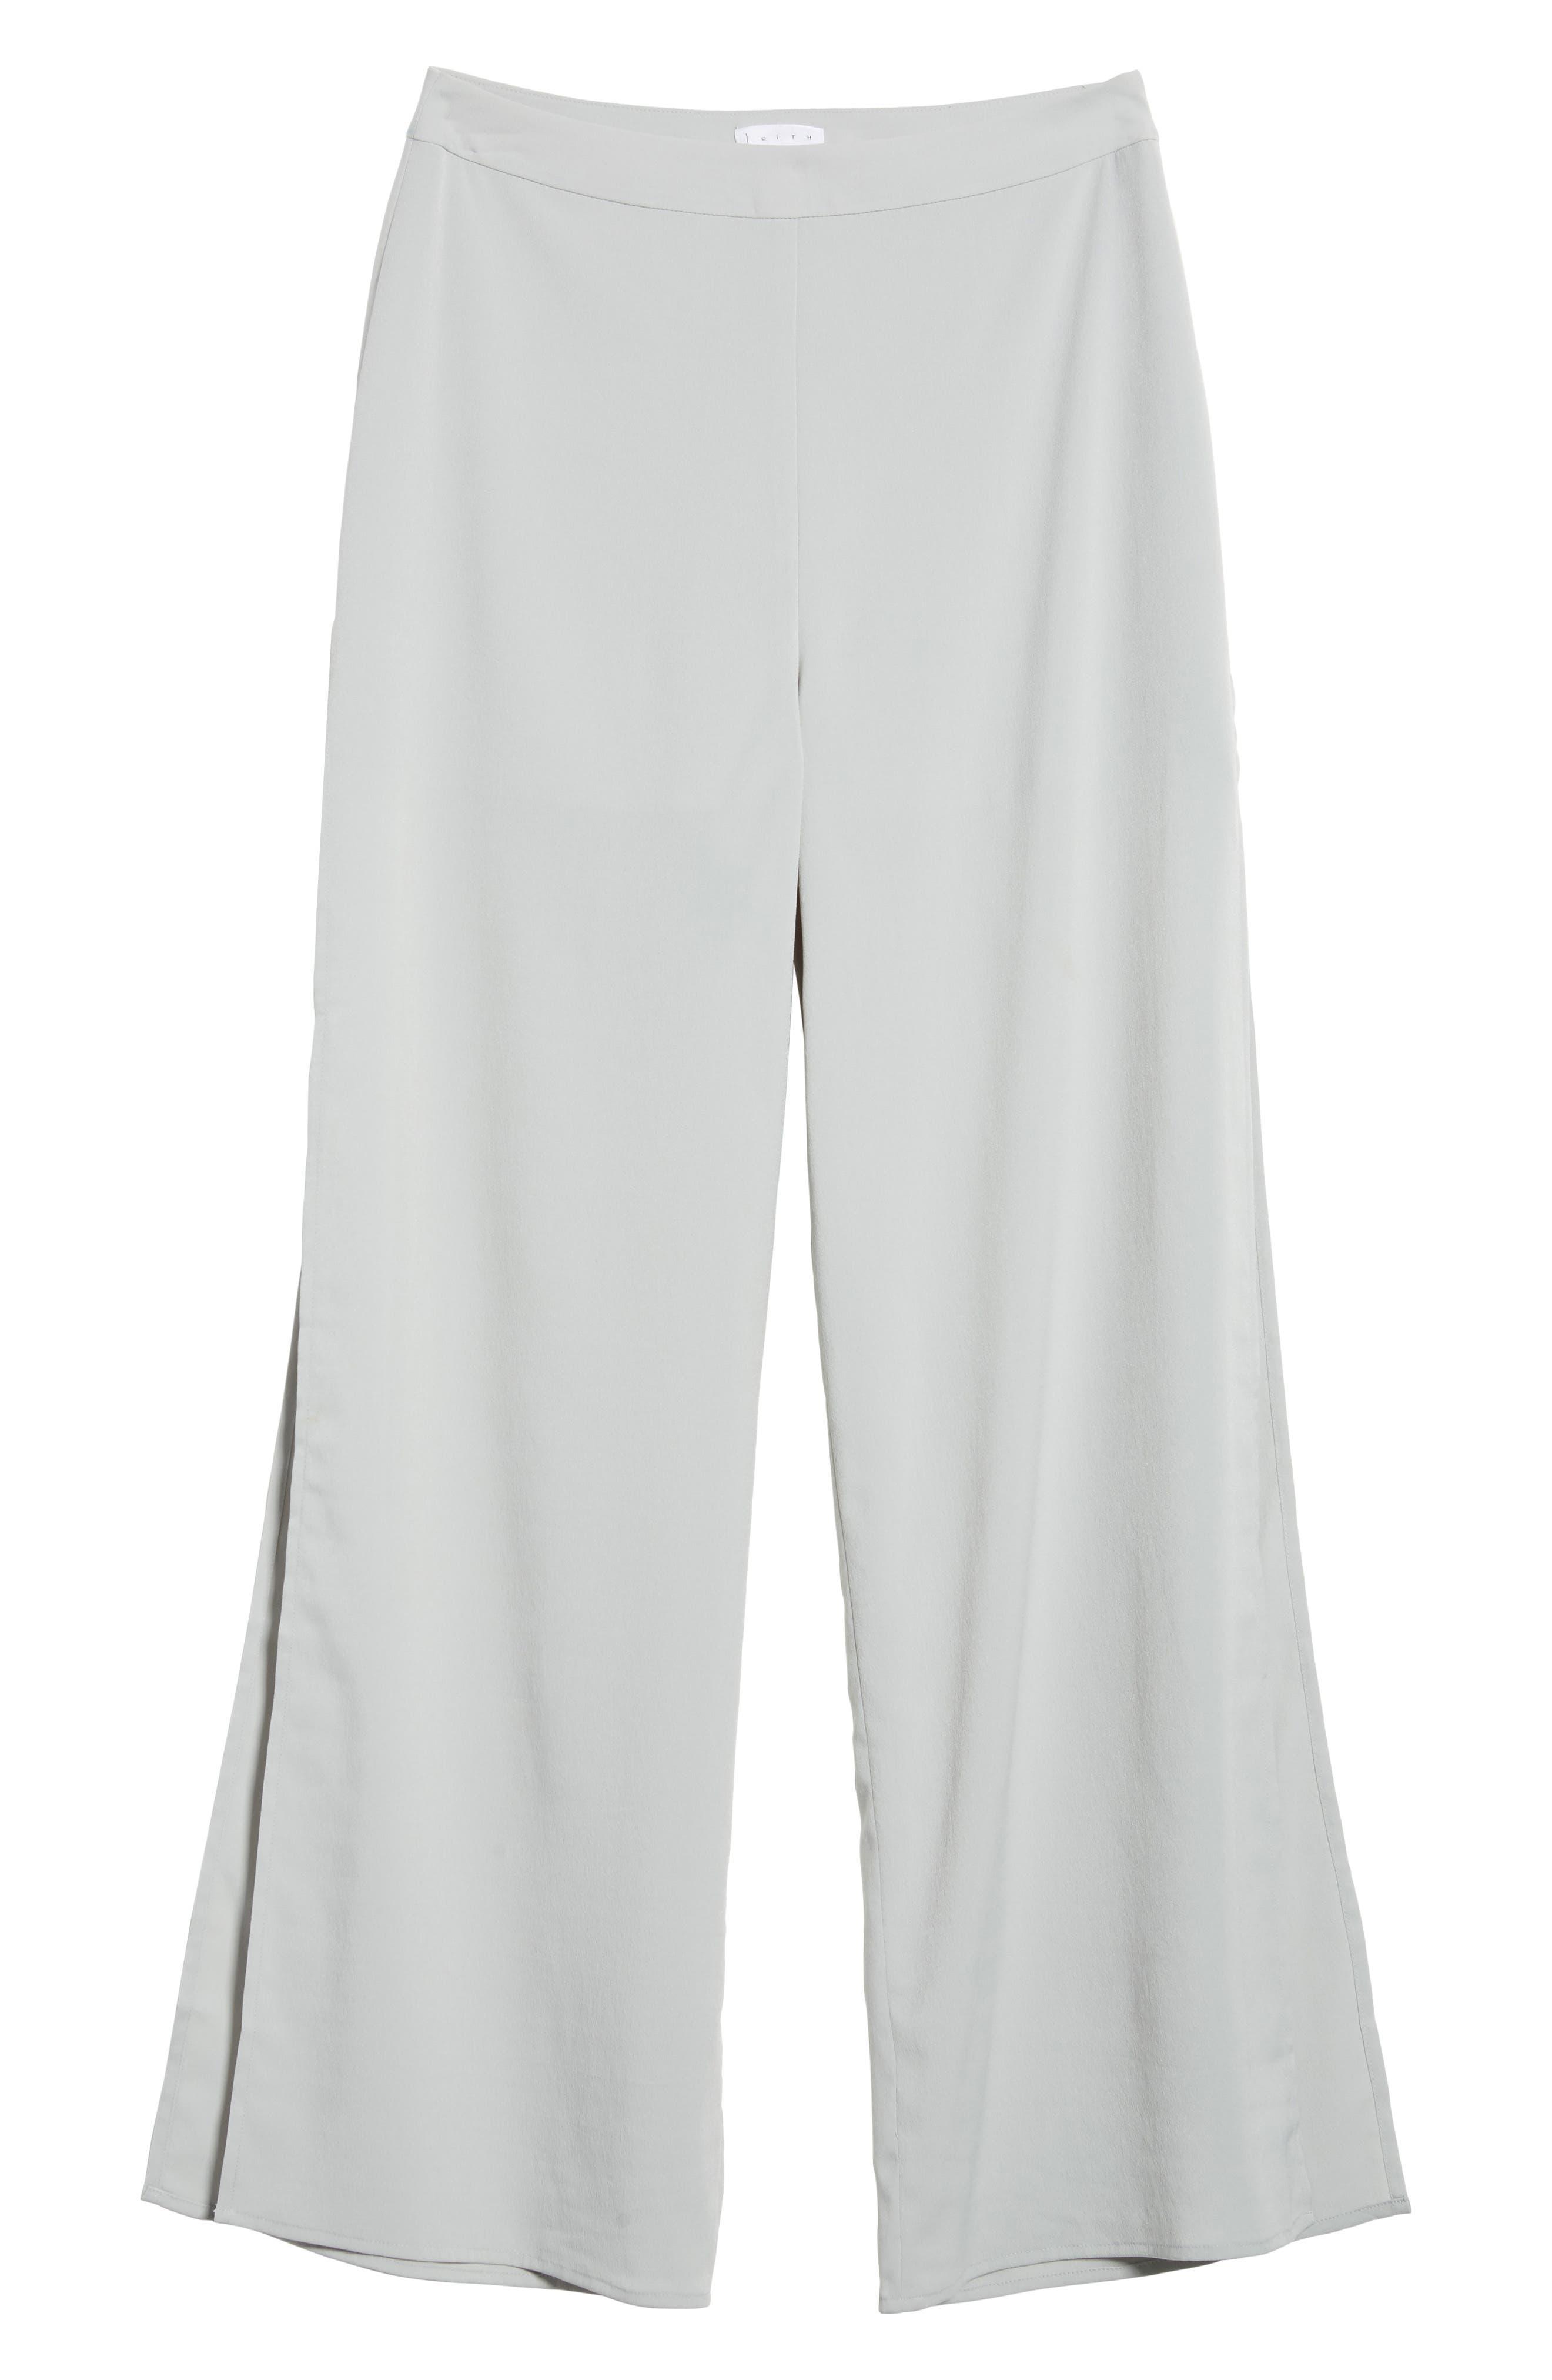 High Waist Side Slit Wide Leg Pants,                             Alternate thumbnail 7, color,                             Blue Pearl